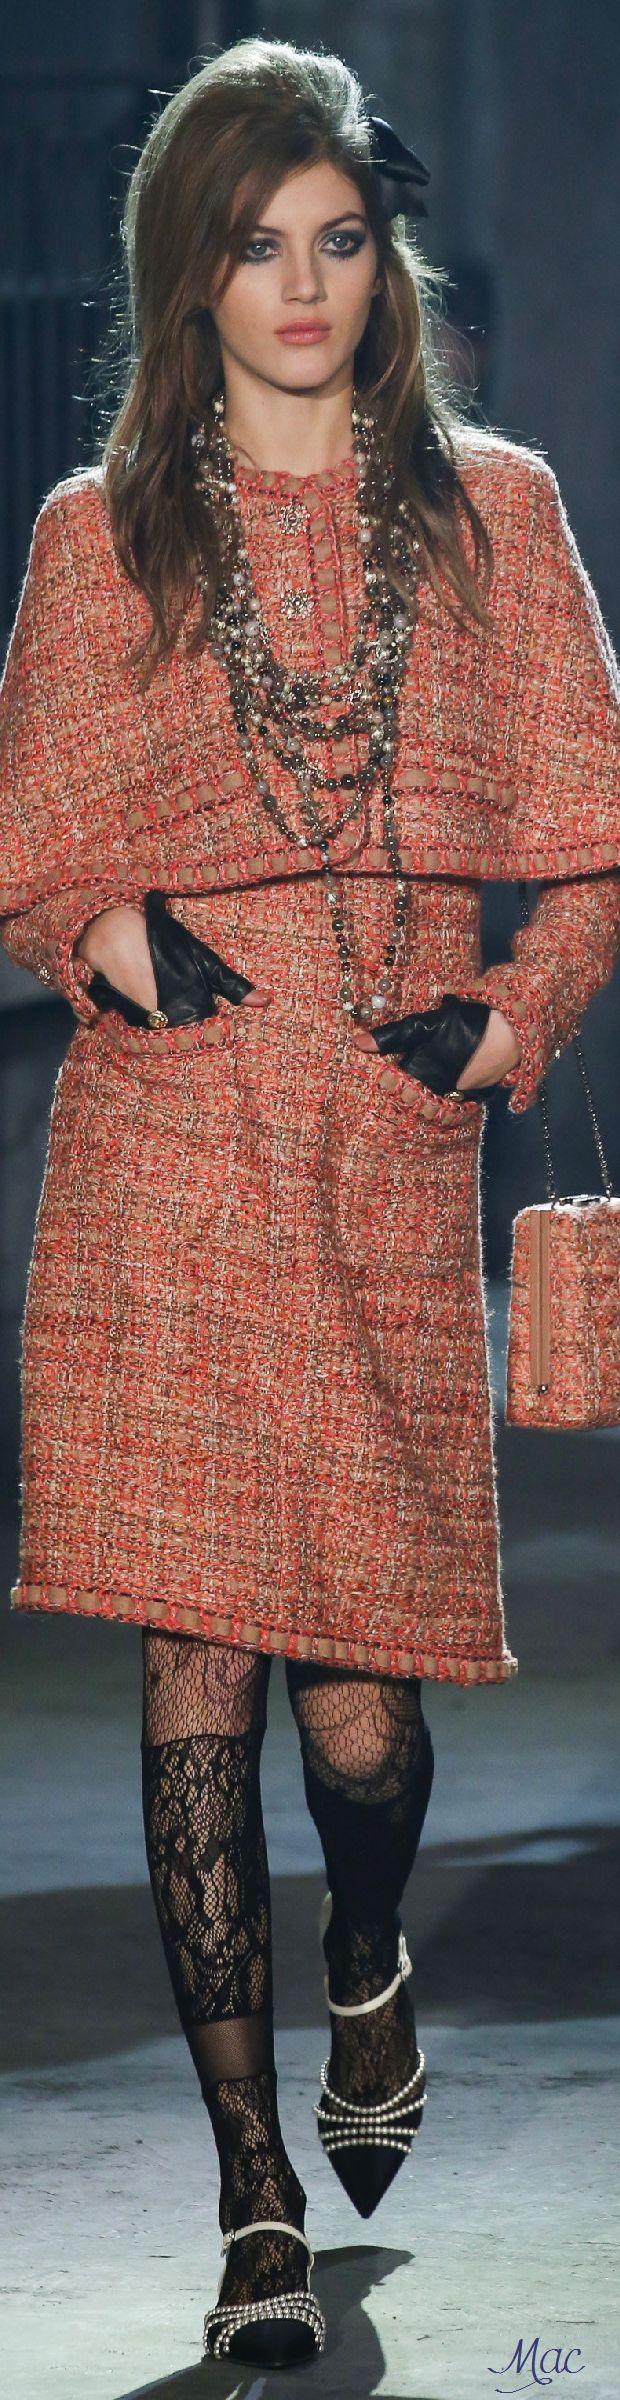 #Farbbberatung #Stilberatung #Farbenreich mit www.farben-reich.com Pre-Fall 2016 Chanel Métiers d'Art